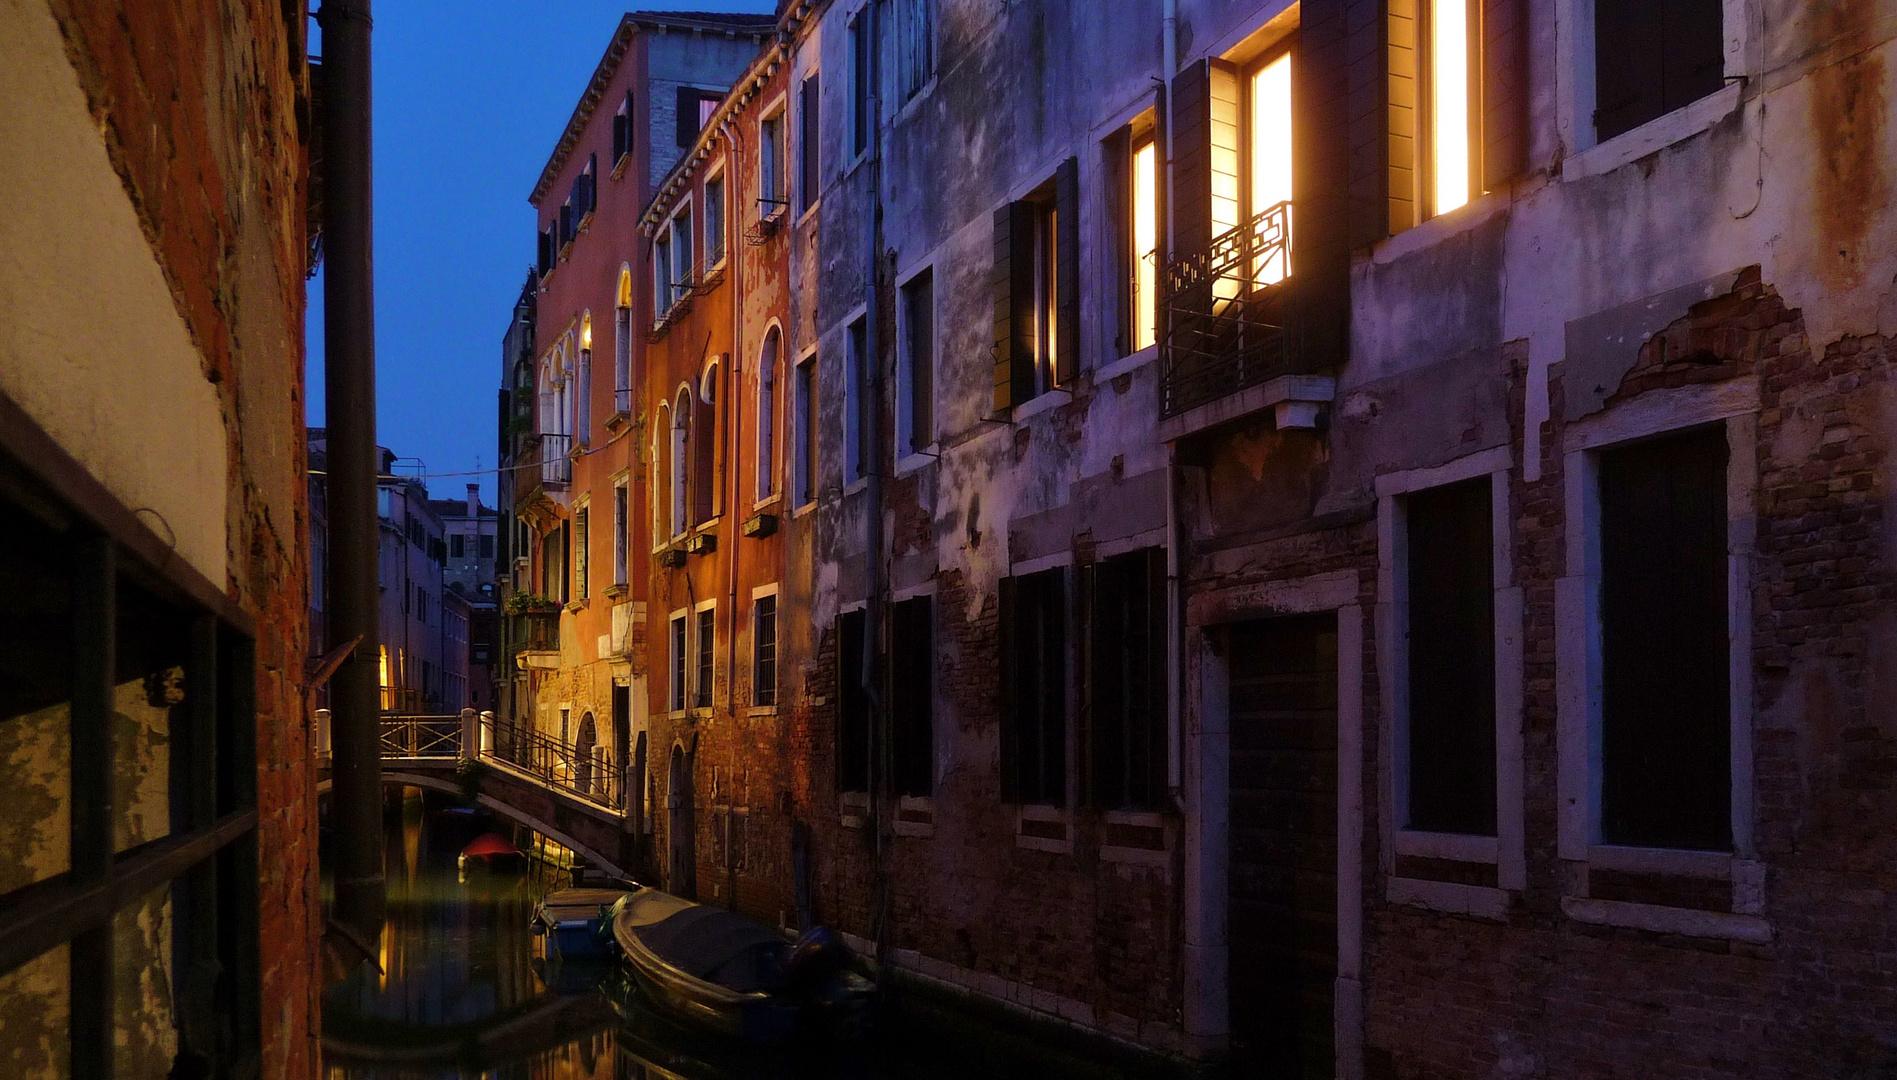 noche veneziana